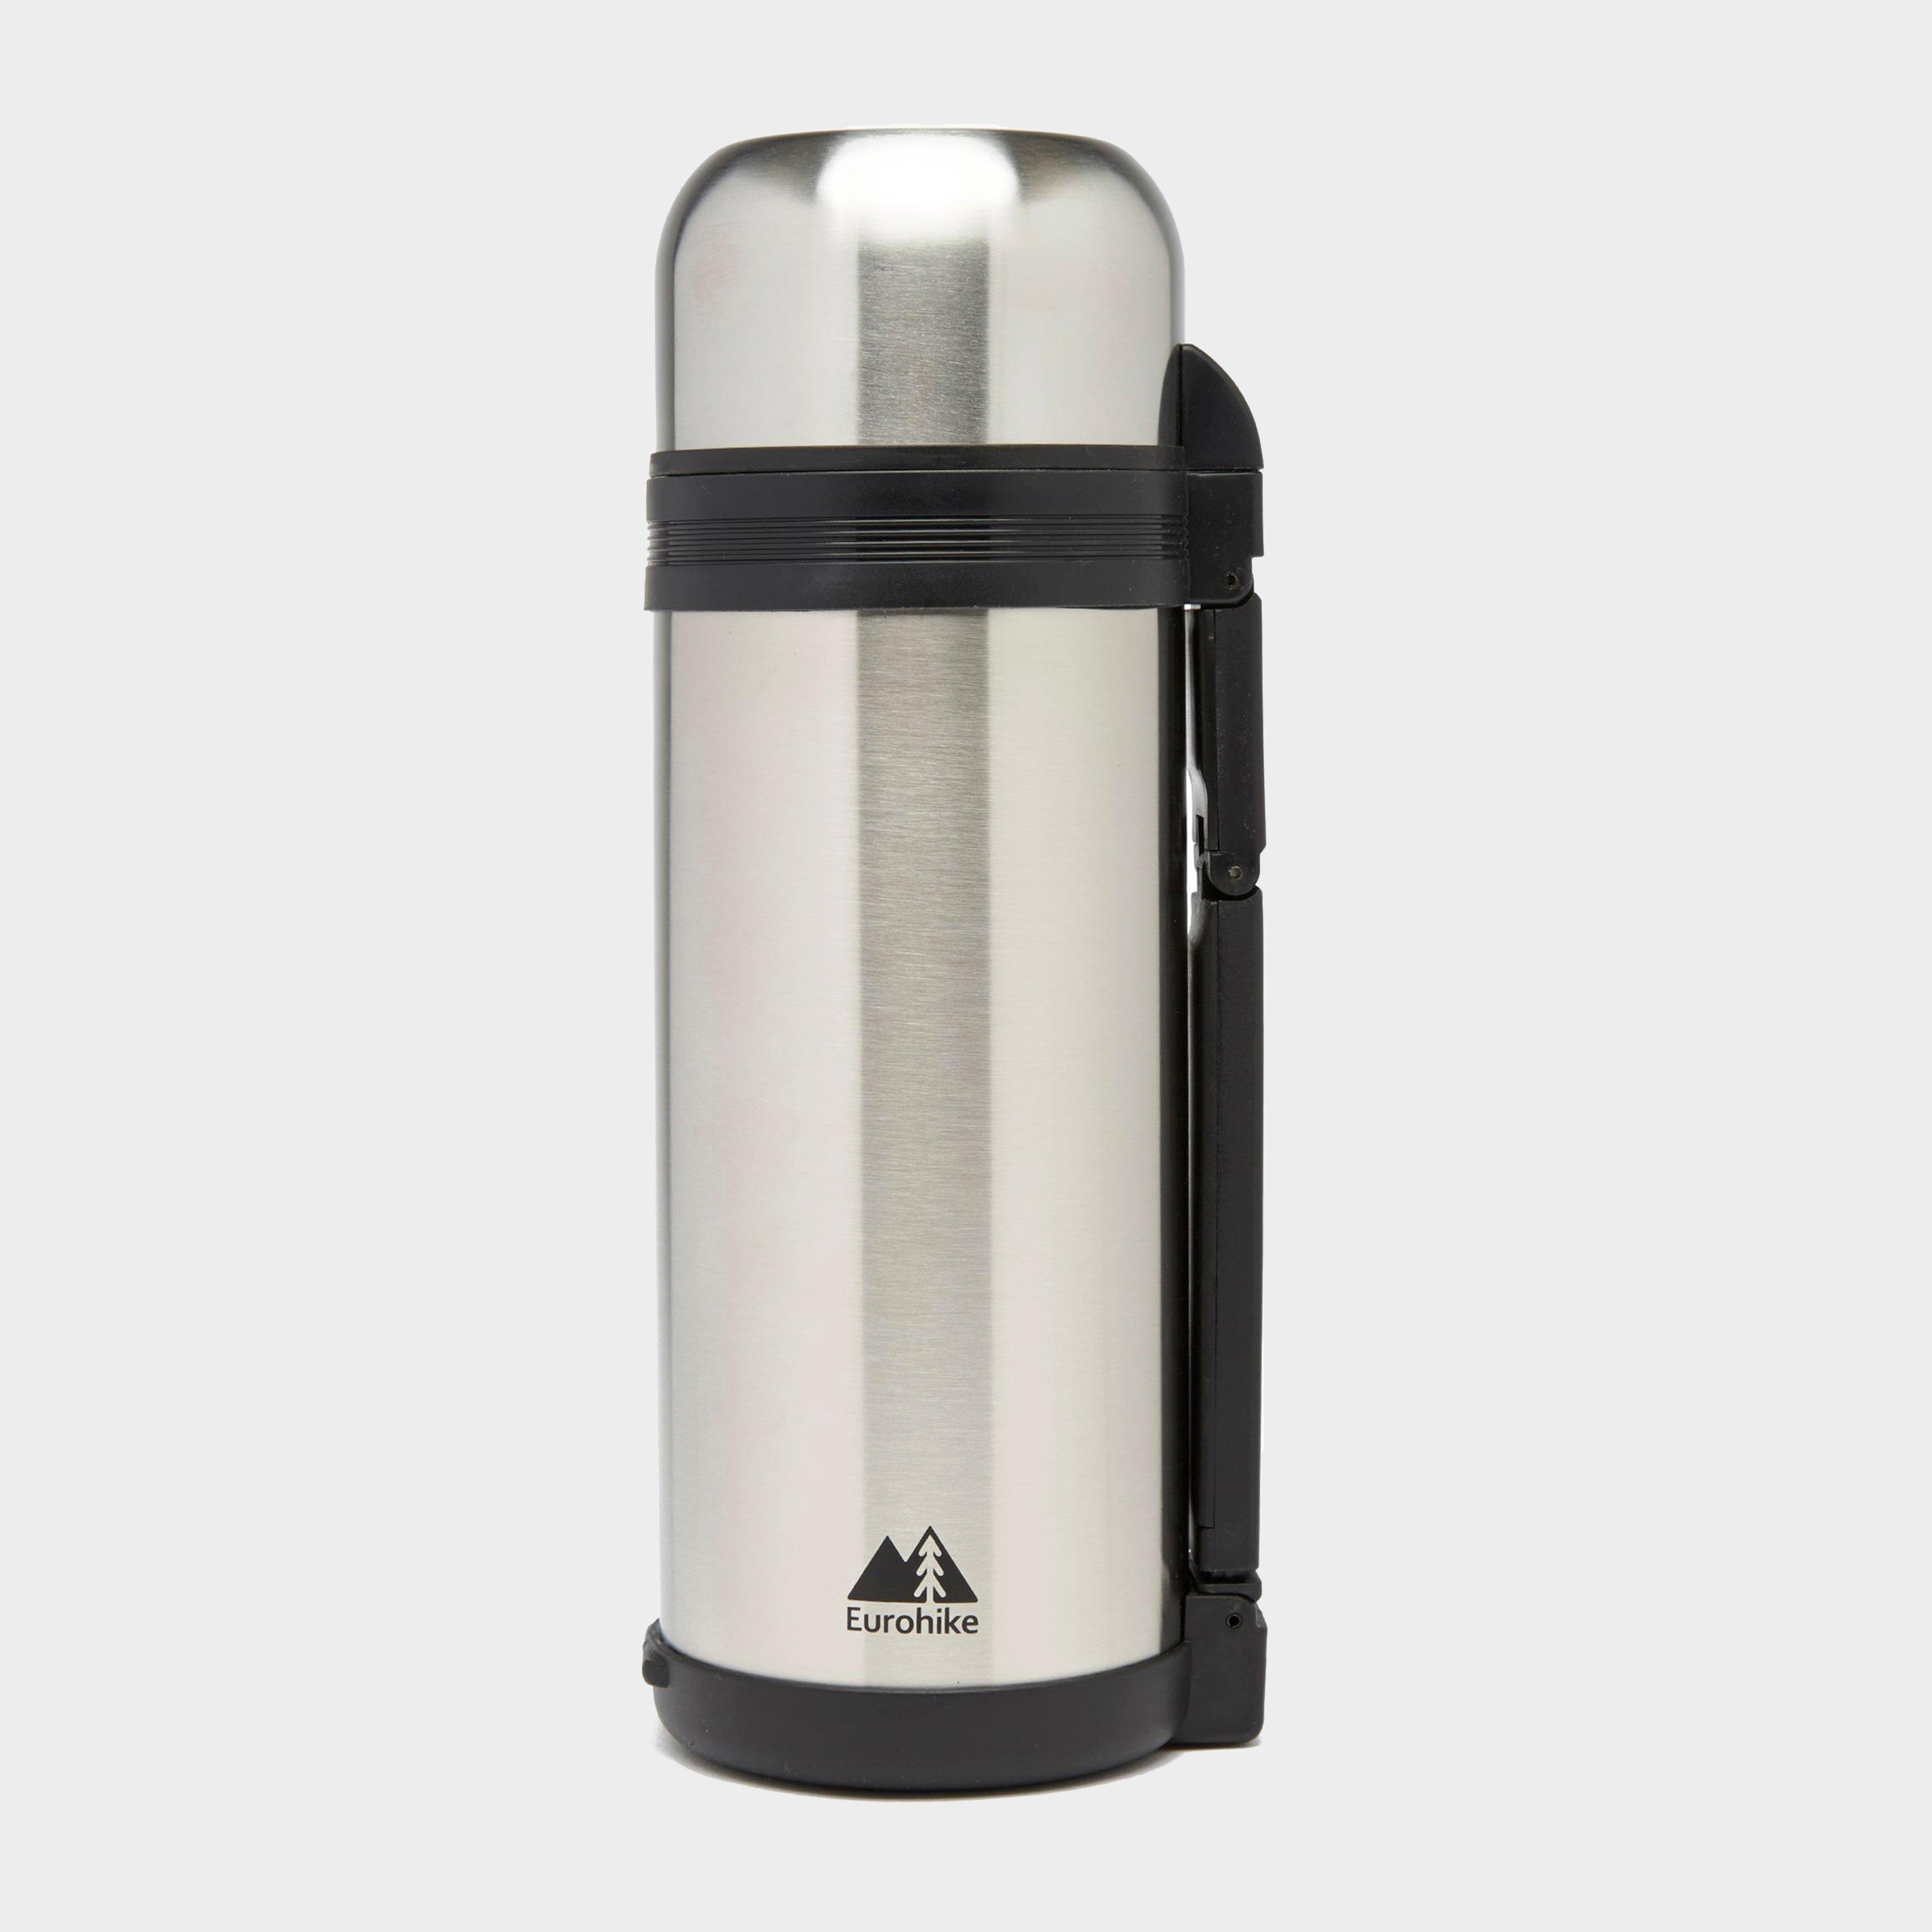 Eurohike Eurohike Stainless Steel Flask 1.5L - Silver, Silver